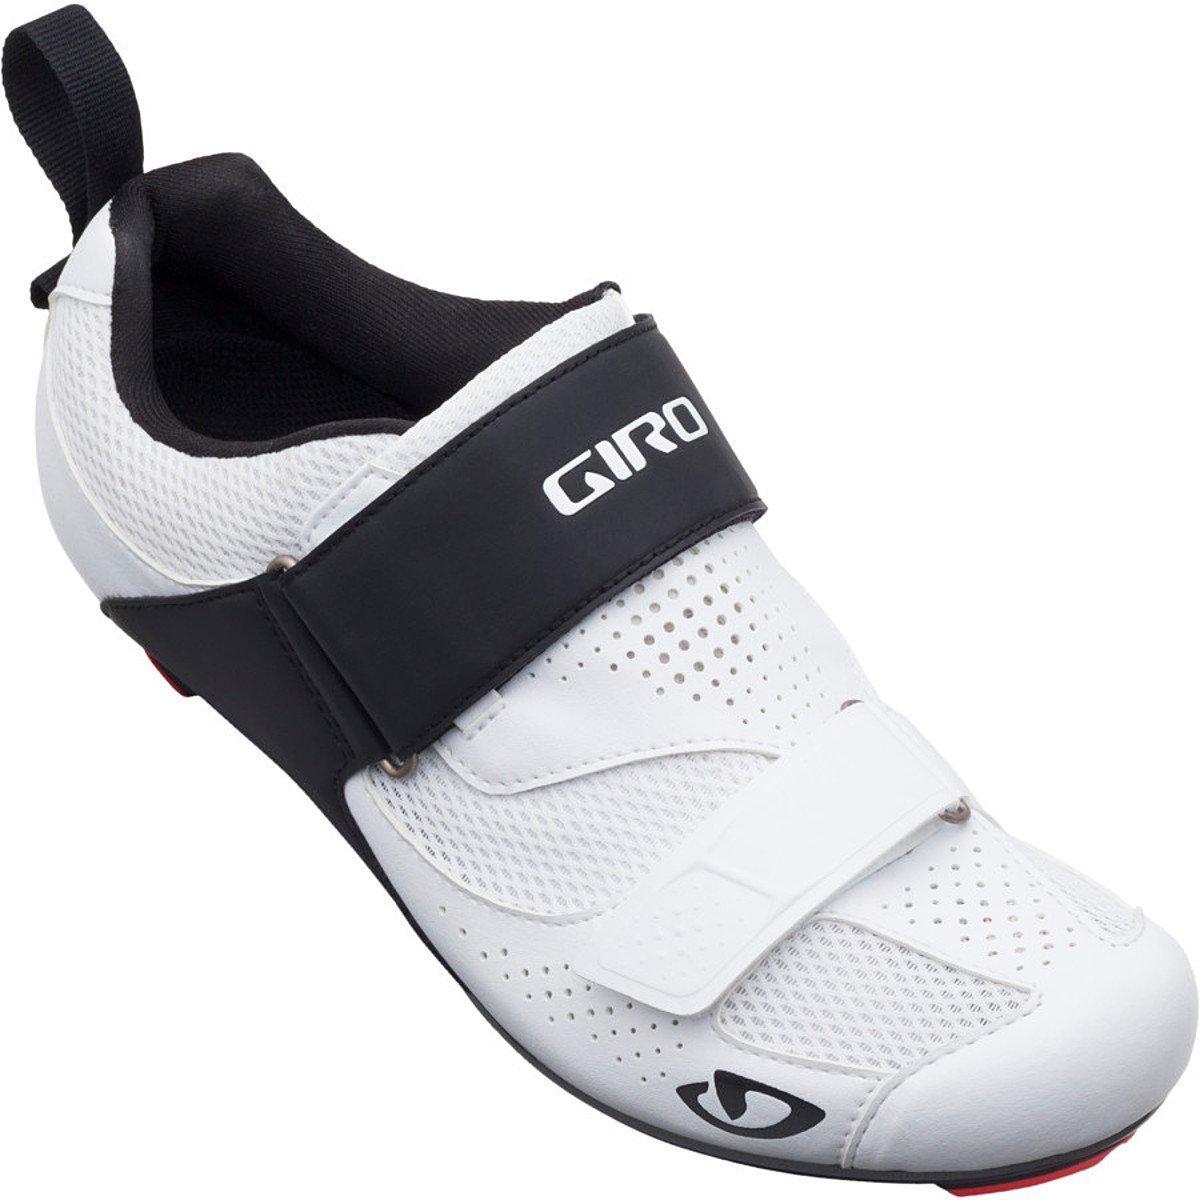 Giro Inciter Tri Shoes - Men's B00FQCZKTI 41.5 EU|White